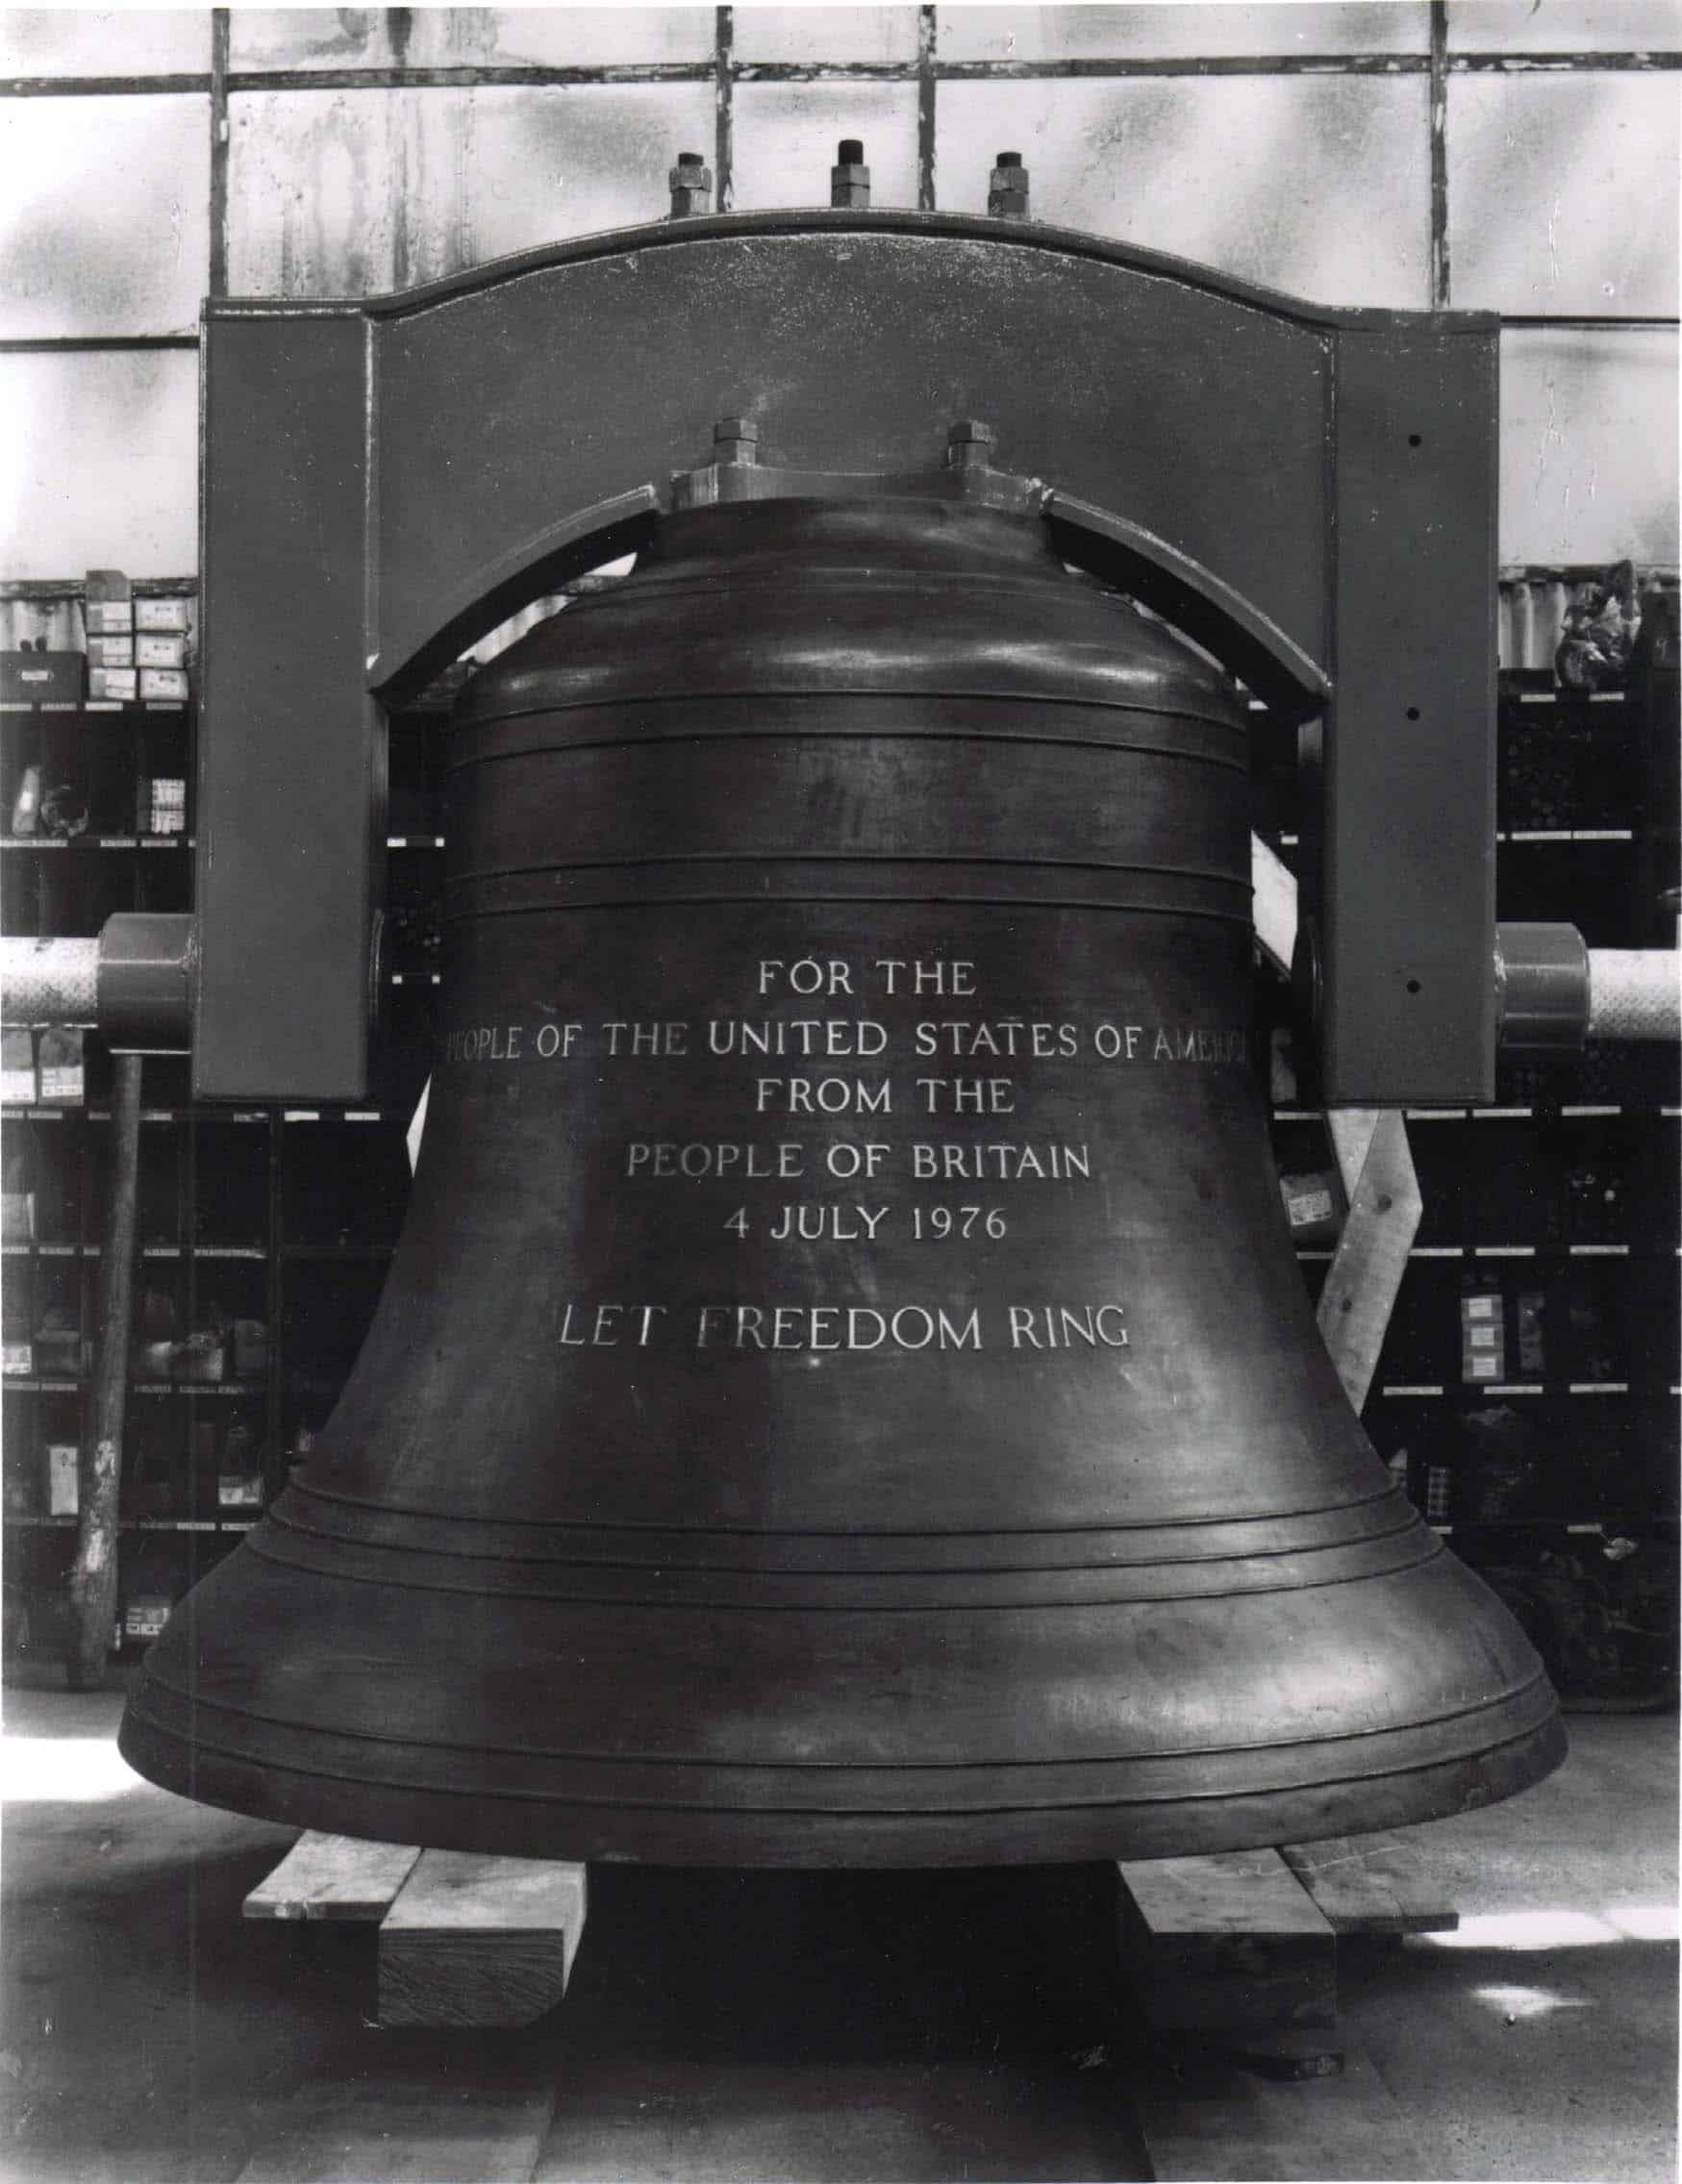 26 Photographs Of The America S 1976 Bicentennial Celebration